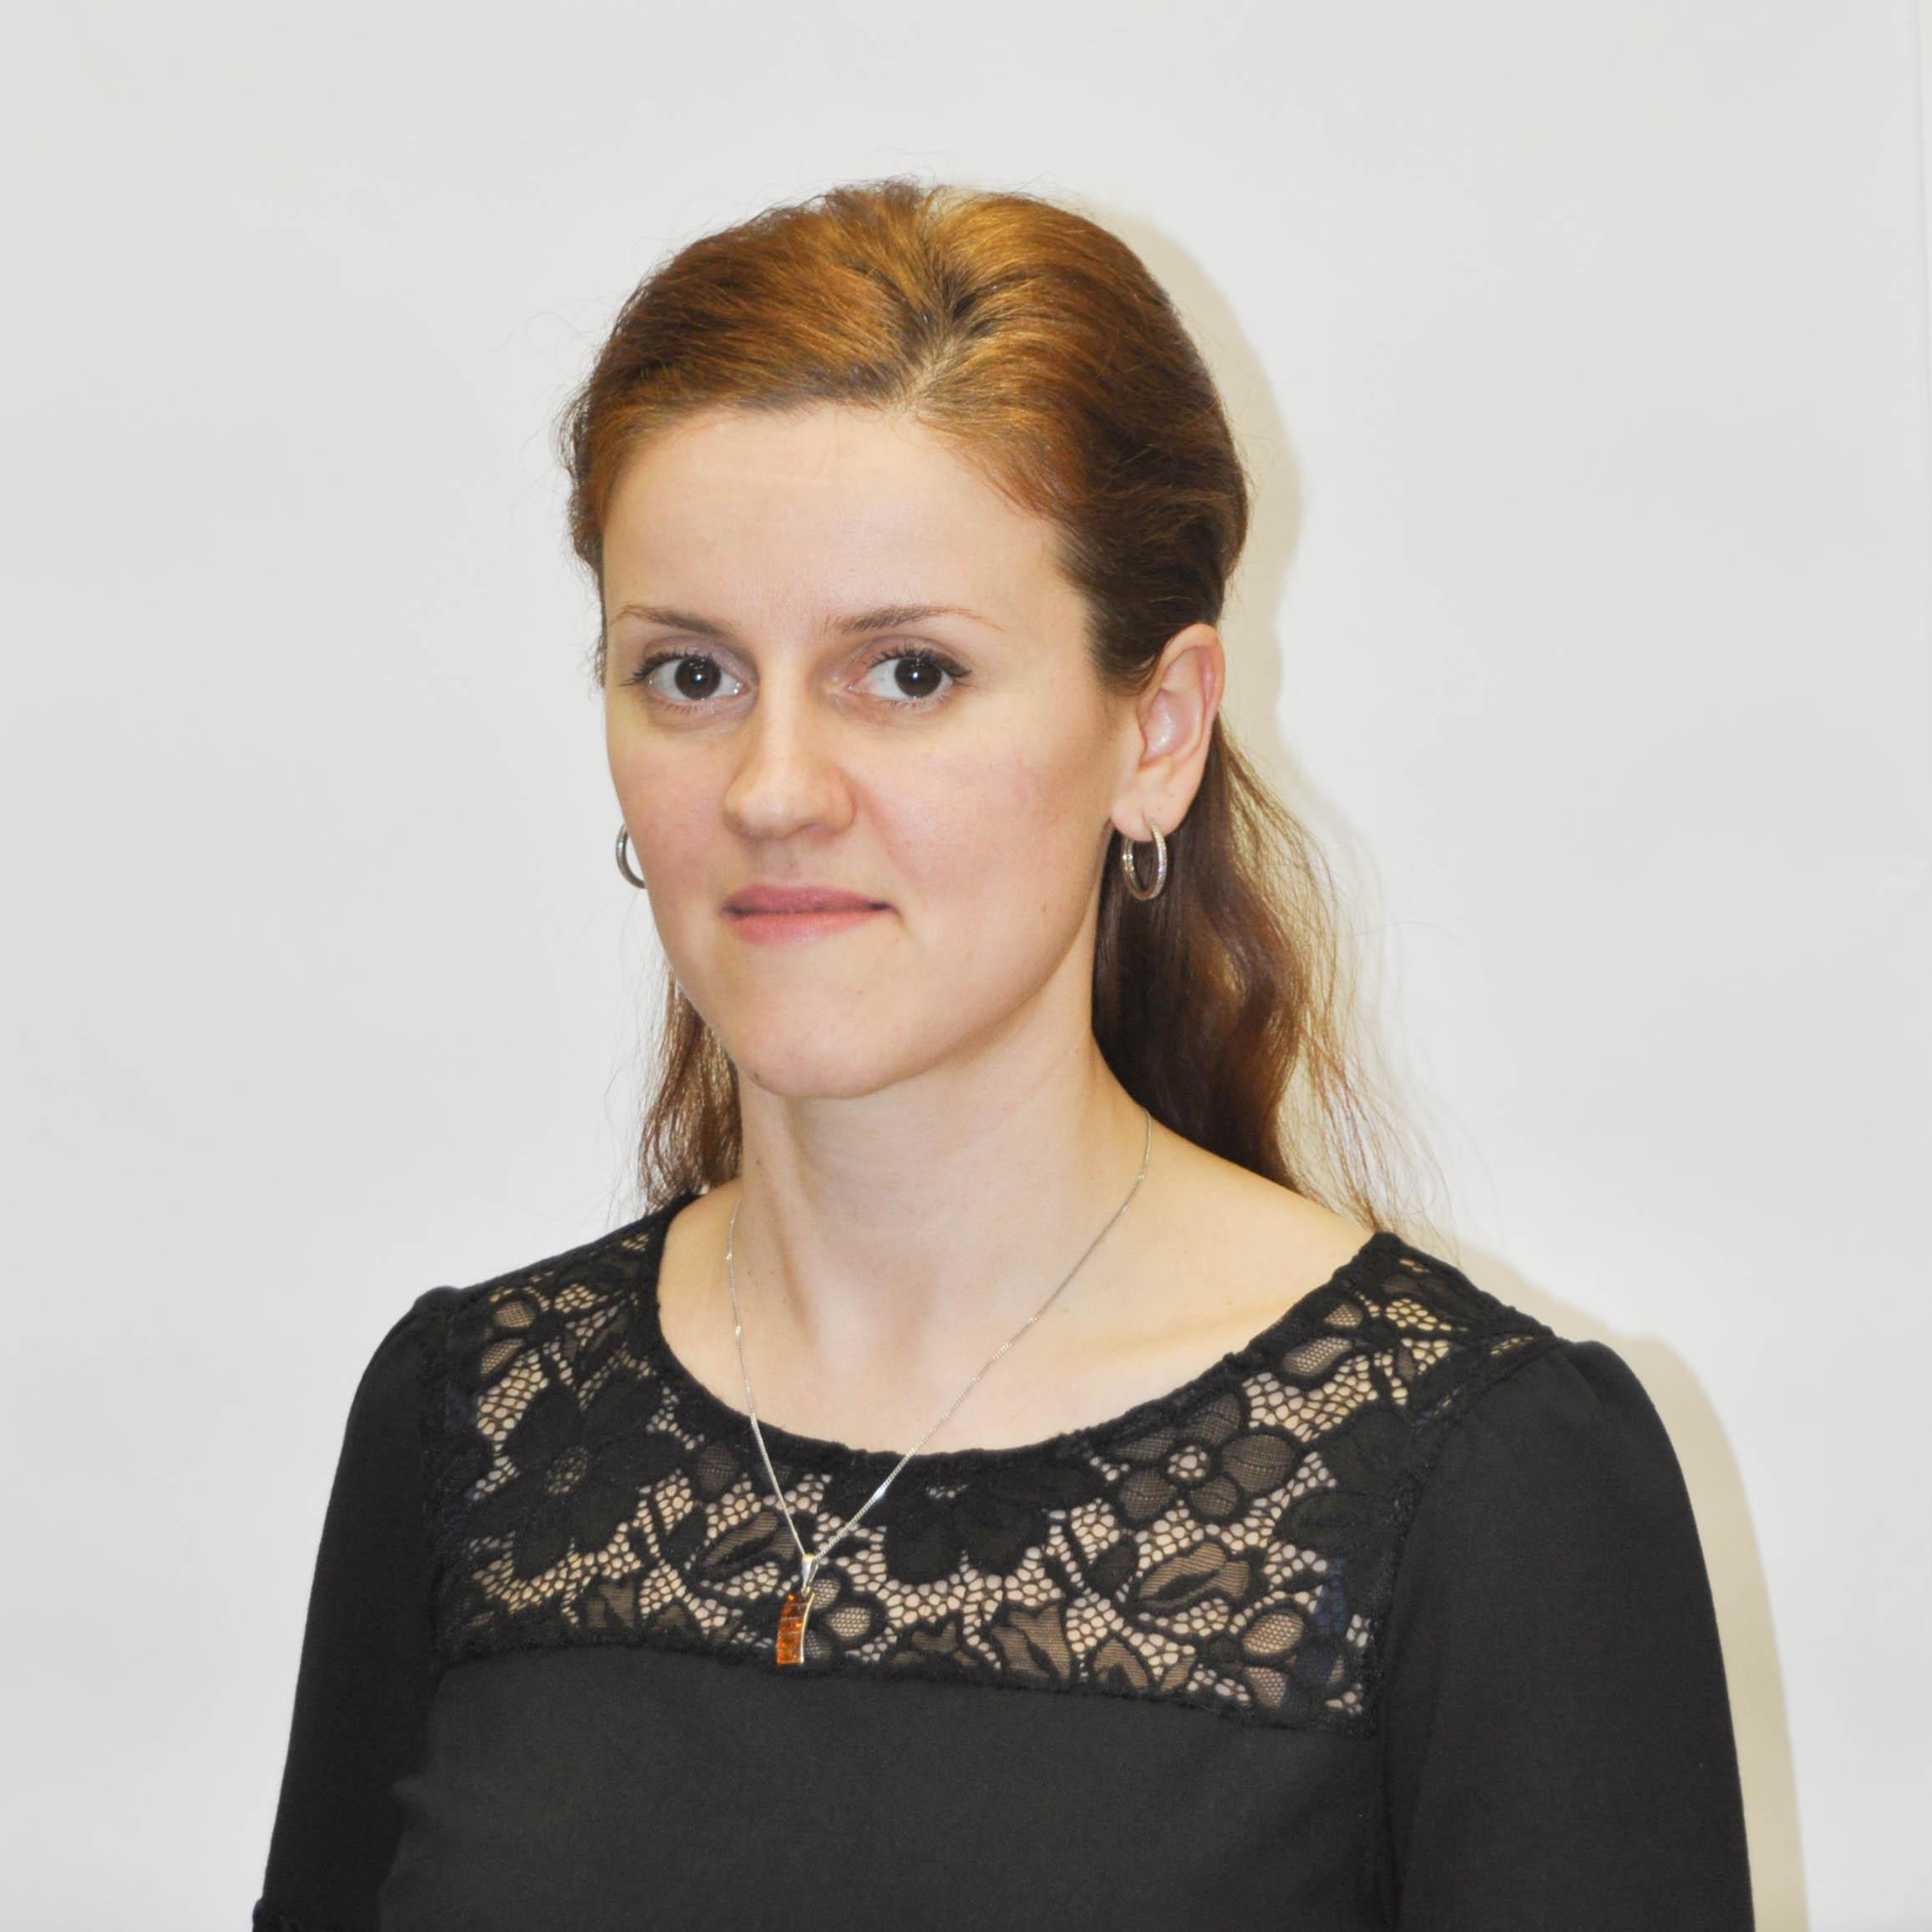 Тарасова Екатерина Васильевна